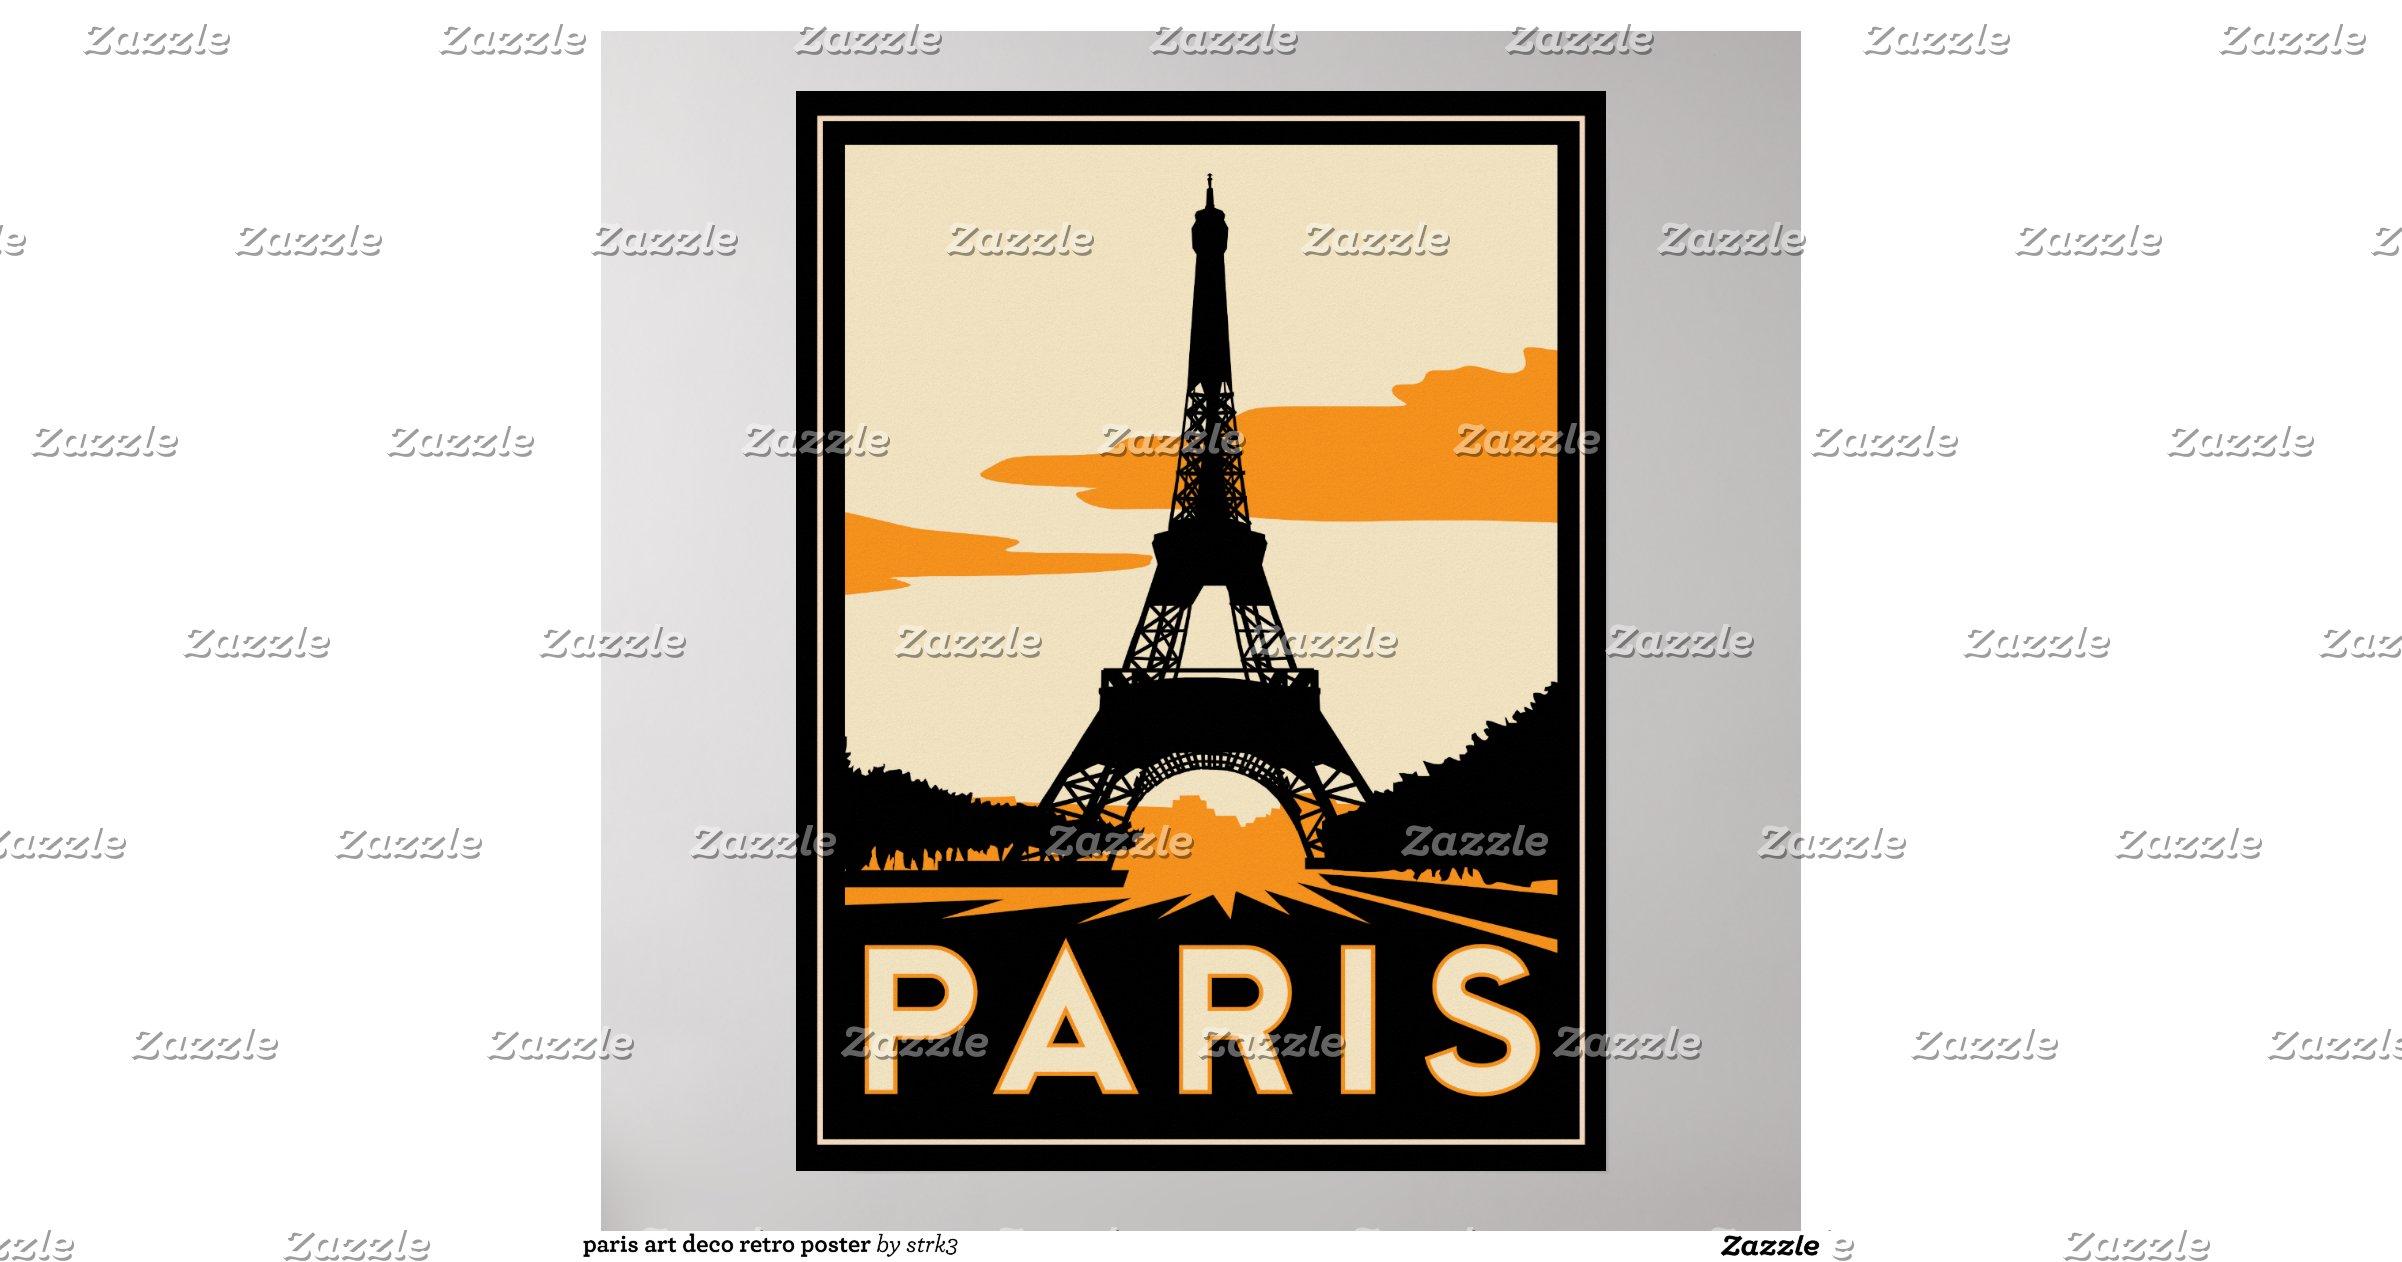 paris art deco retro poster r22735103495846f5bad5daebbac13fb4 wv4 8byvr. Black Bedroom Furniture Sets. Home Design Ideas